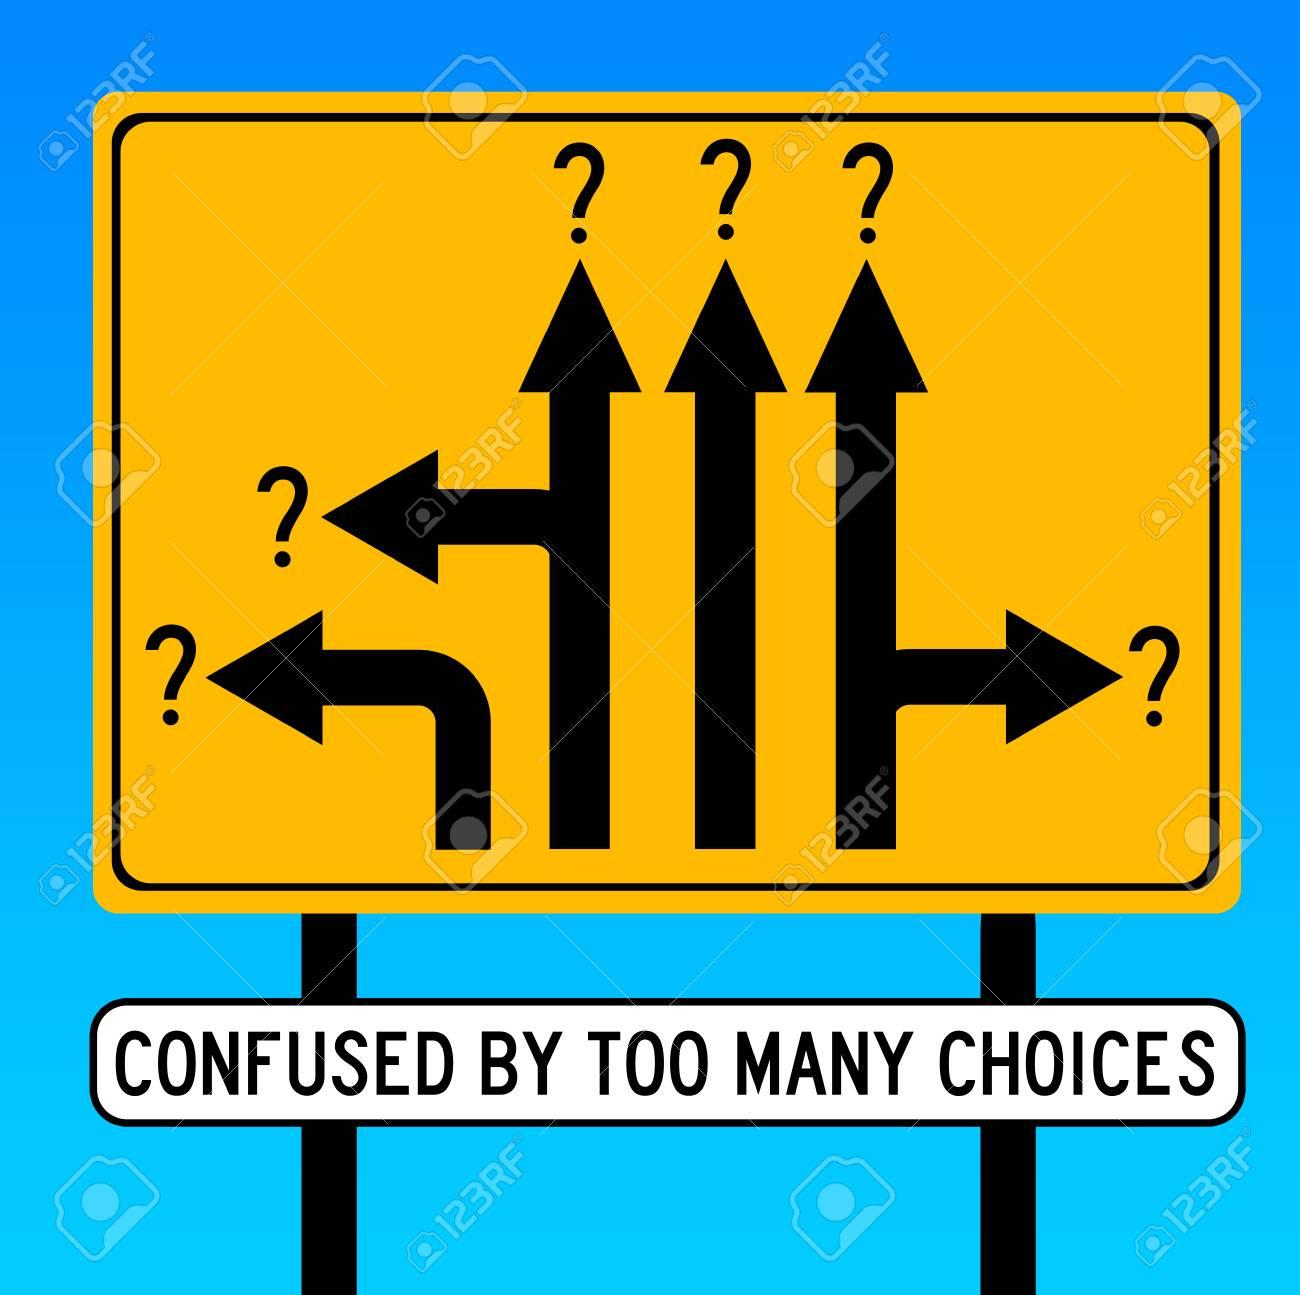 too many choices illustration - 117045391